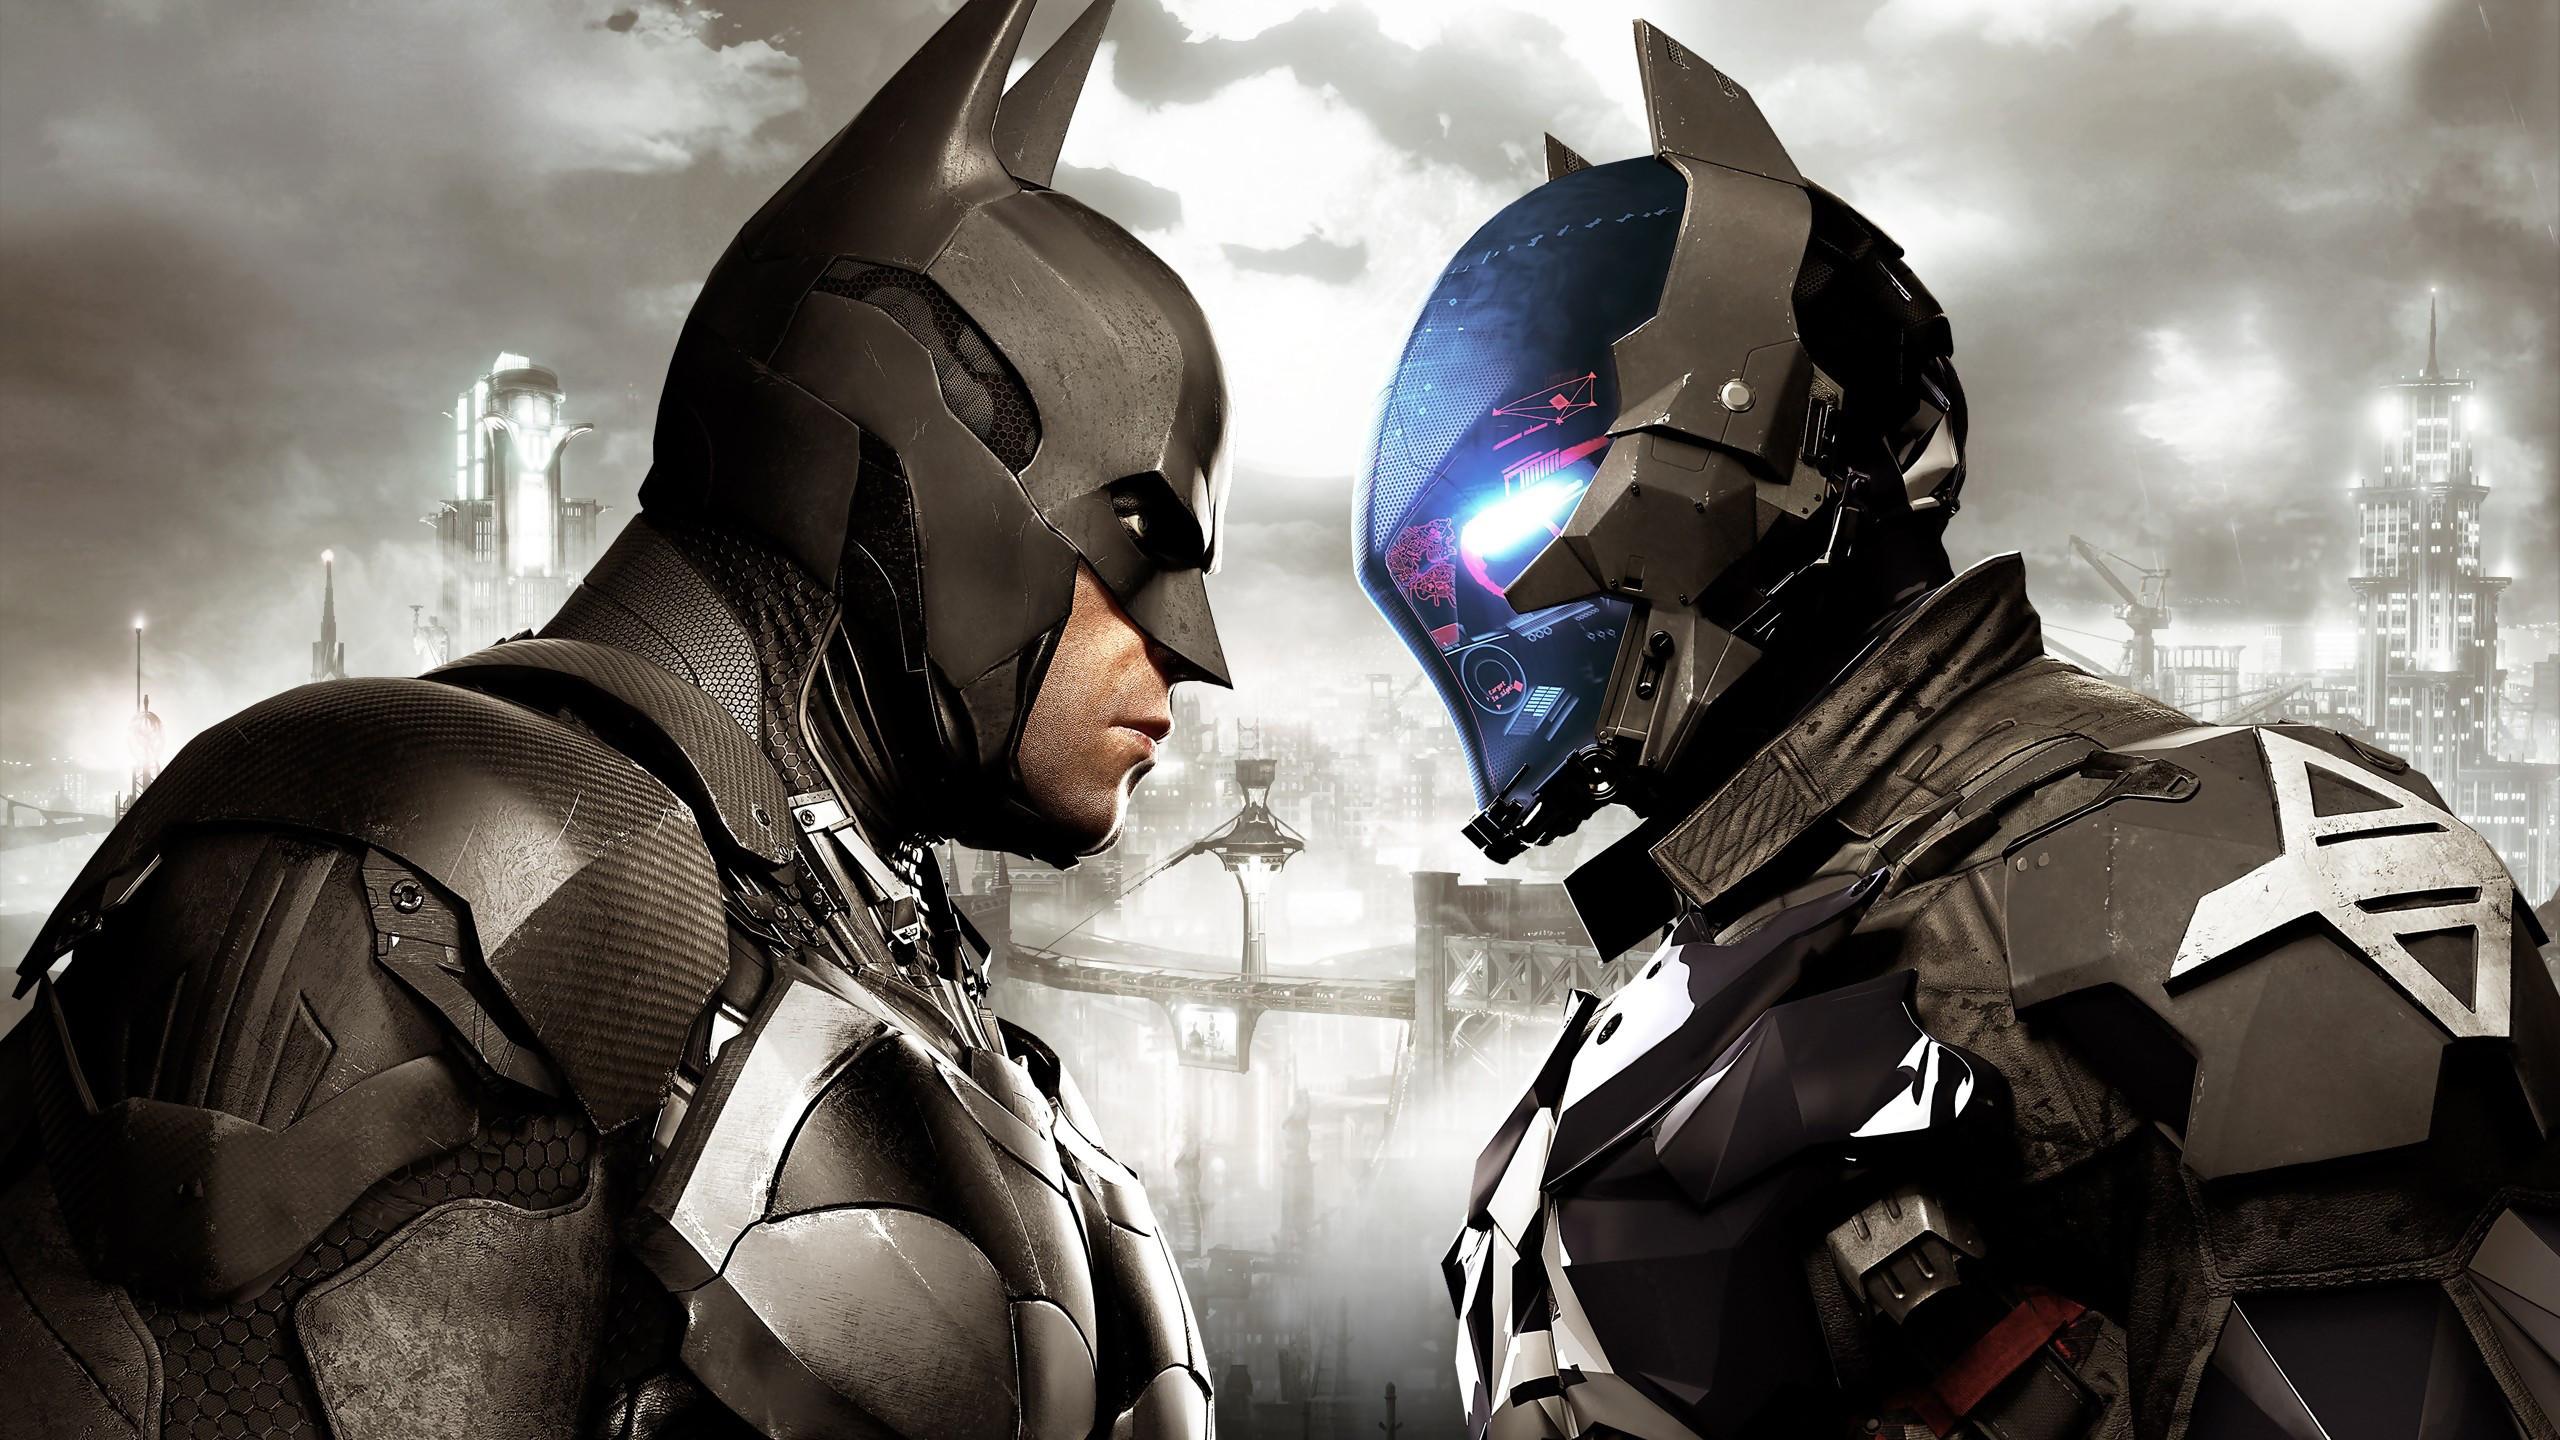 Res: 2560x1440, Batman Arkham Knight Wallpapers Phone On Wallpaper Hd 2560 x 1440 px 1.08  MB trilogy 1080p